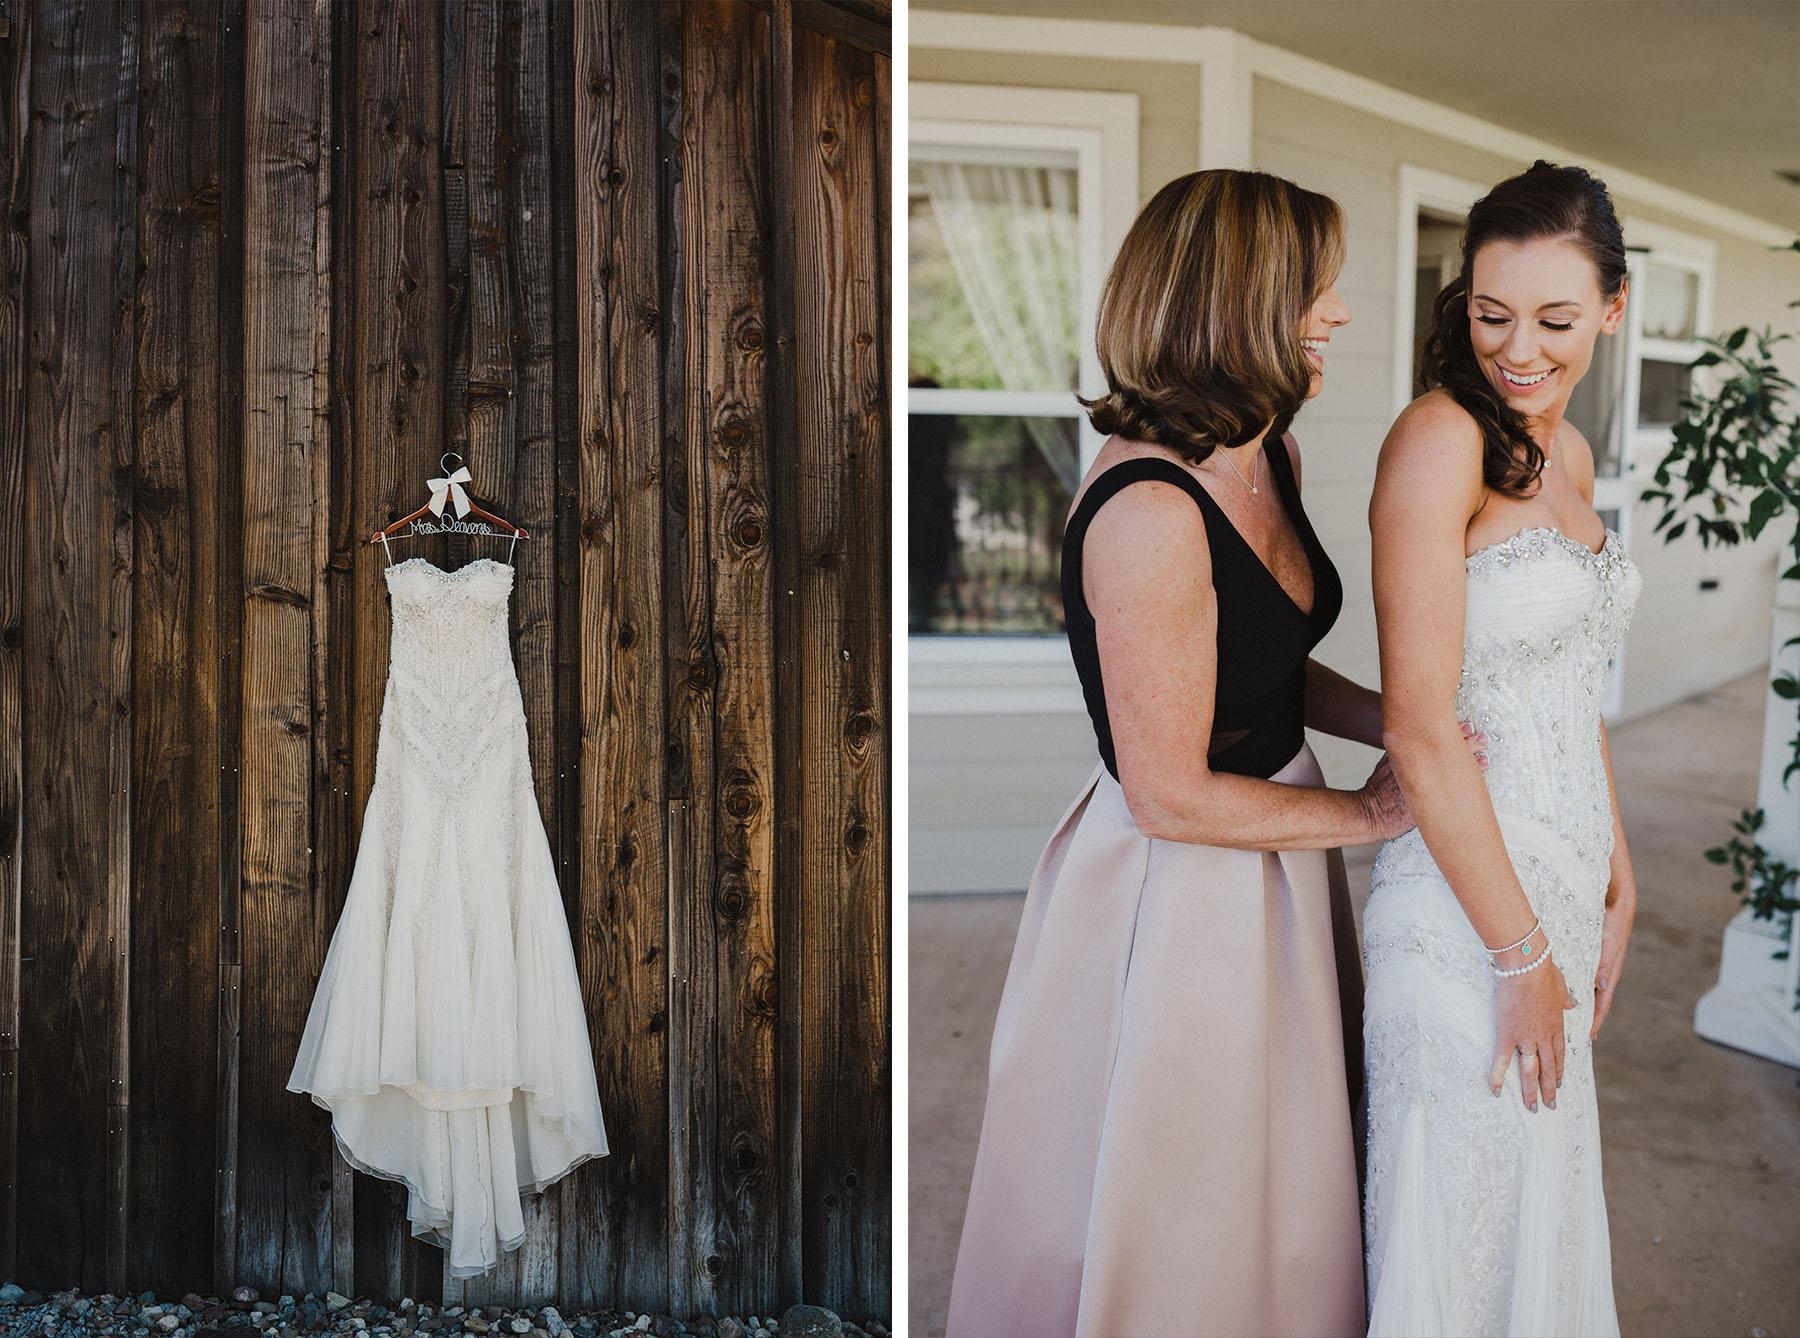 C+J-Grace-Maralyn-Estate-wedding-1.jpg